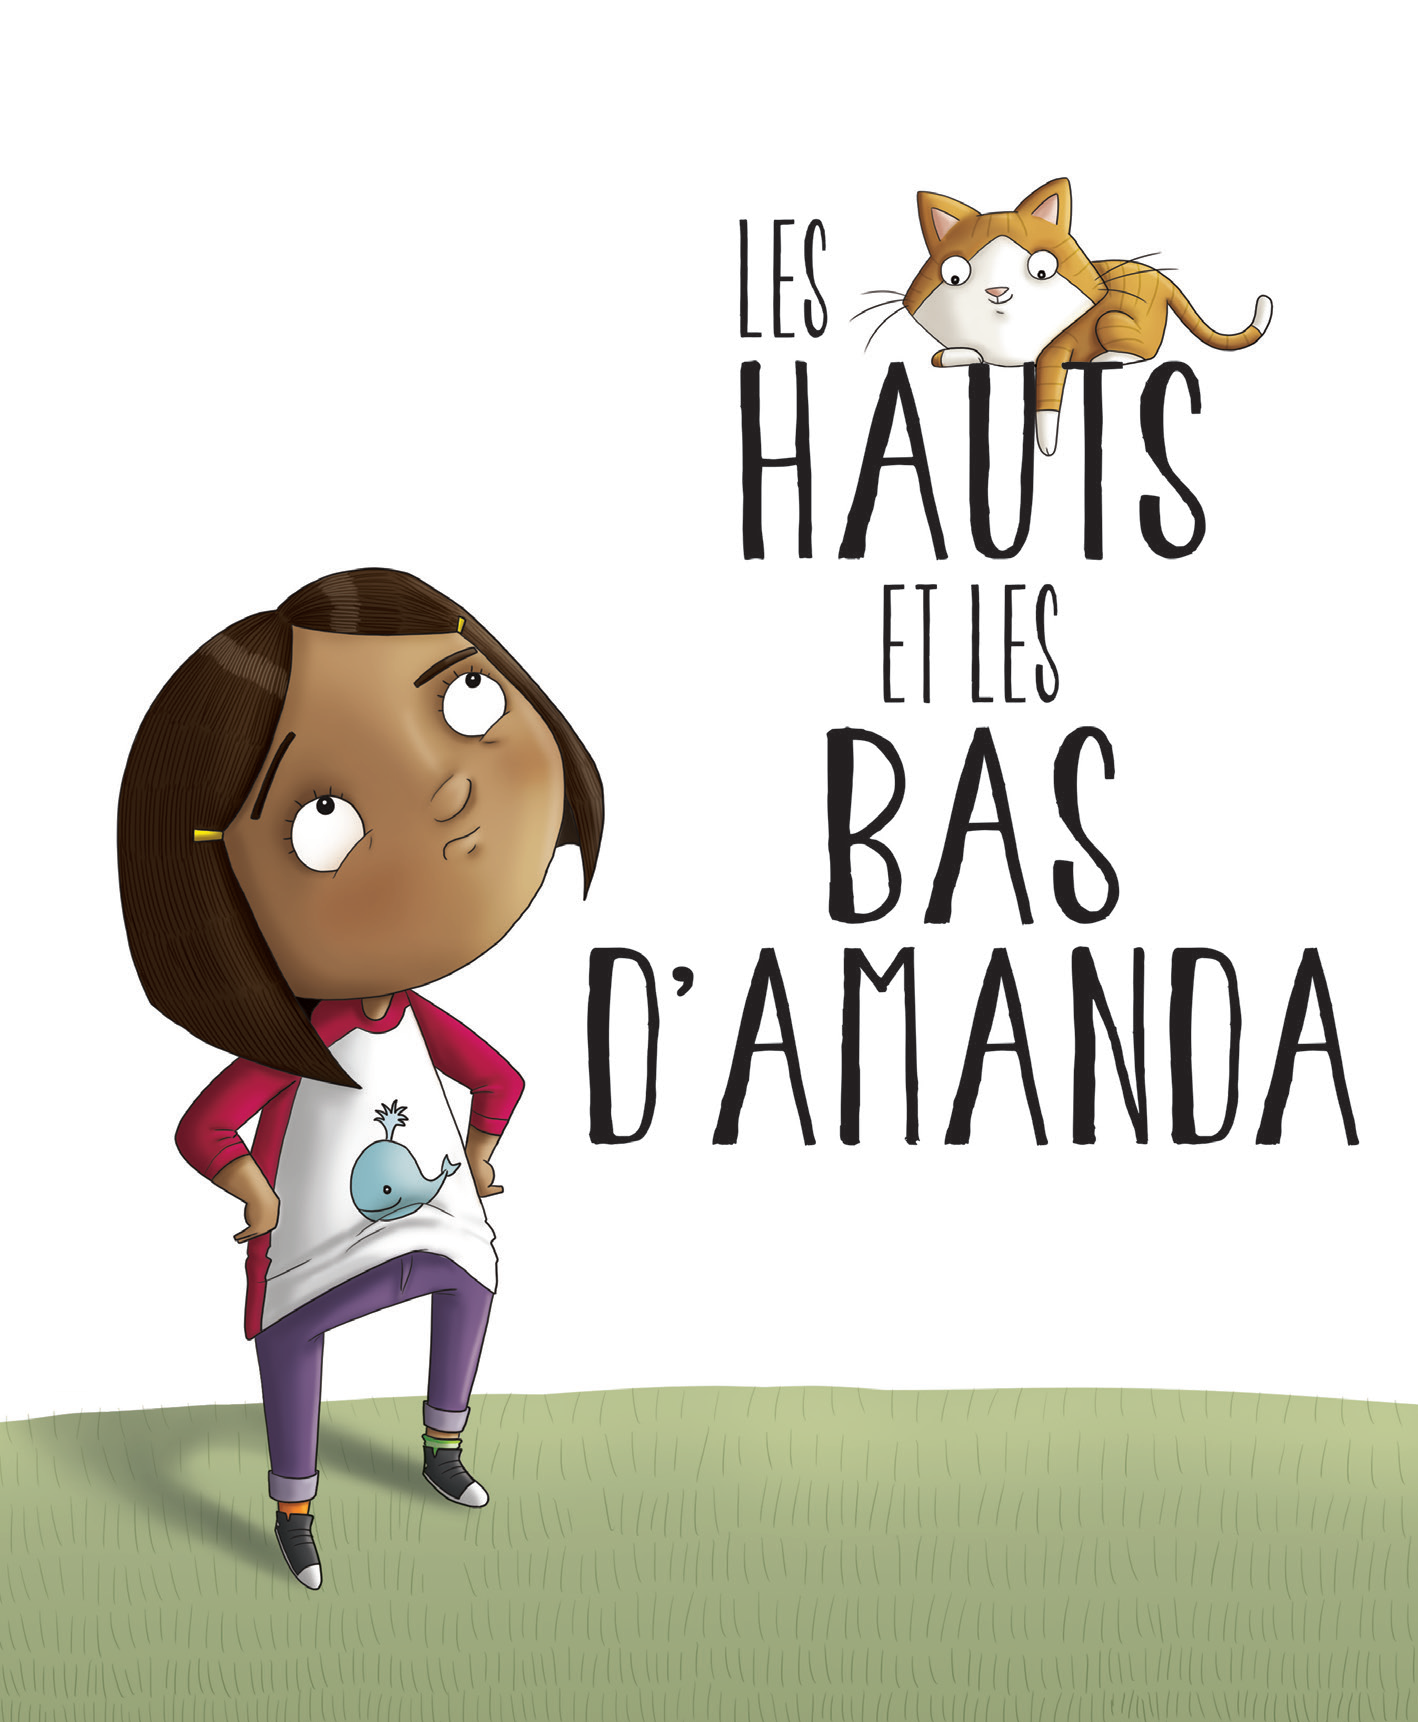 Les_hauts_et_les_bas.png (1.04 MB)